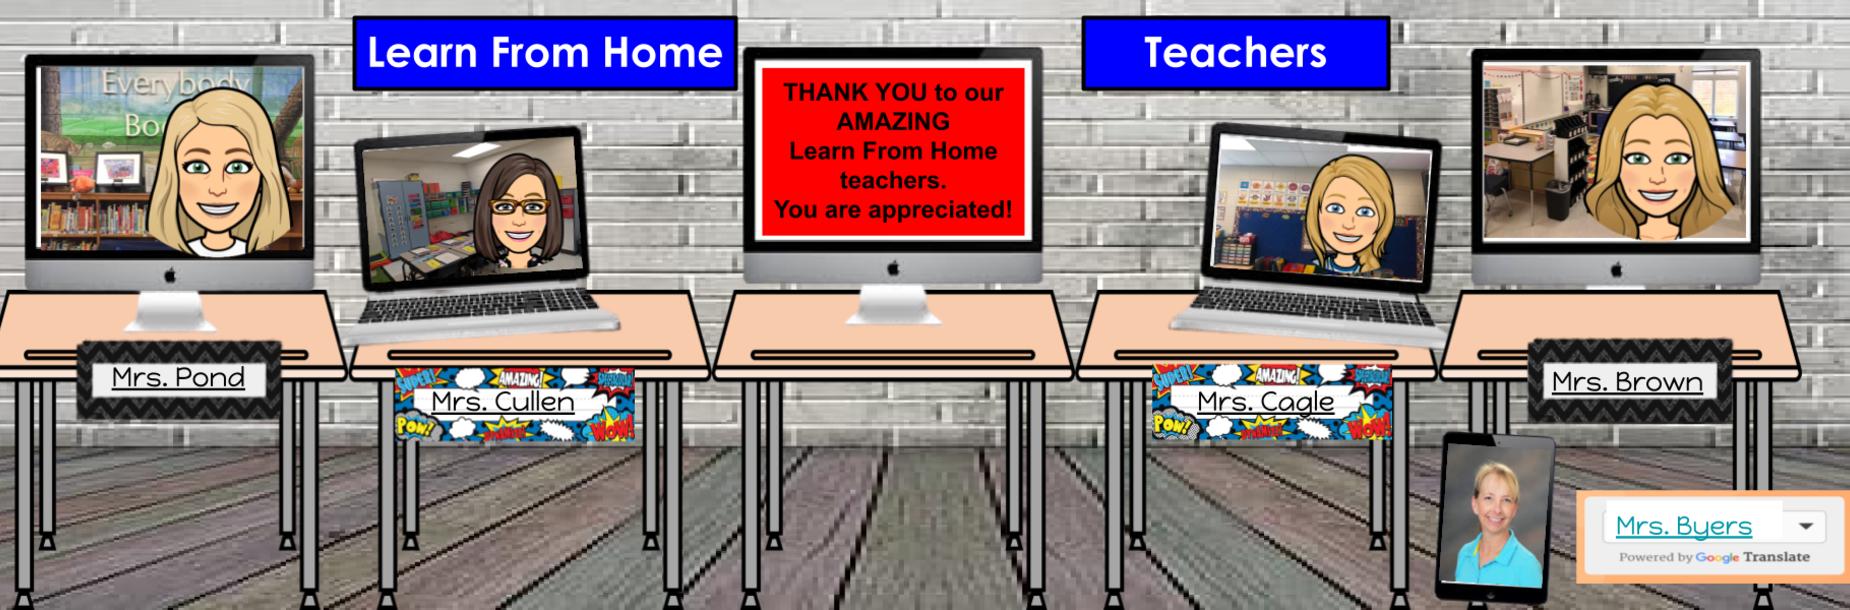 LFH teachers